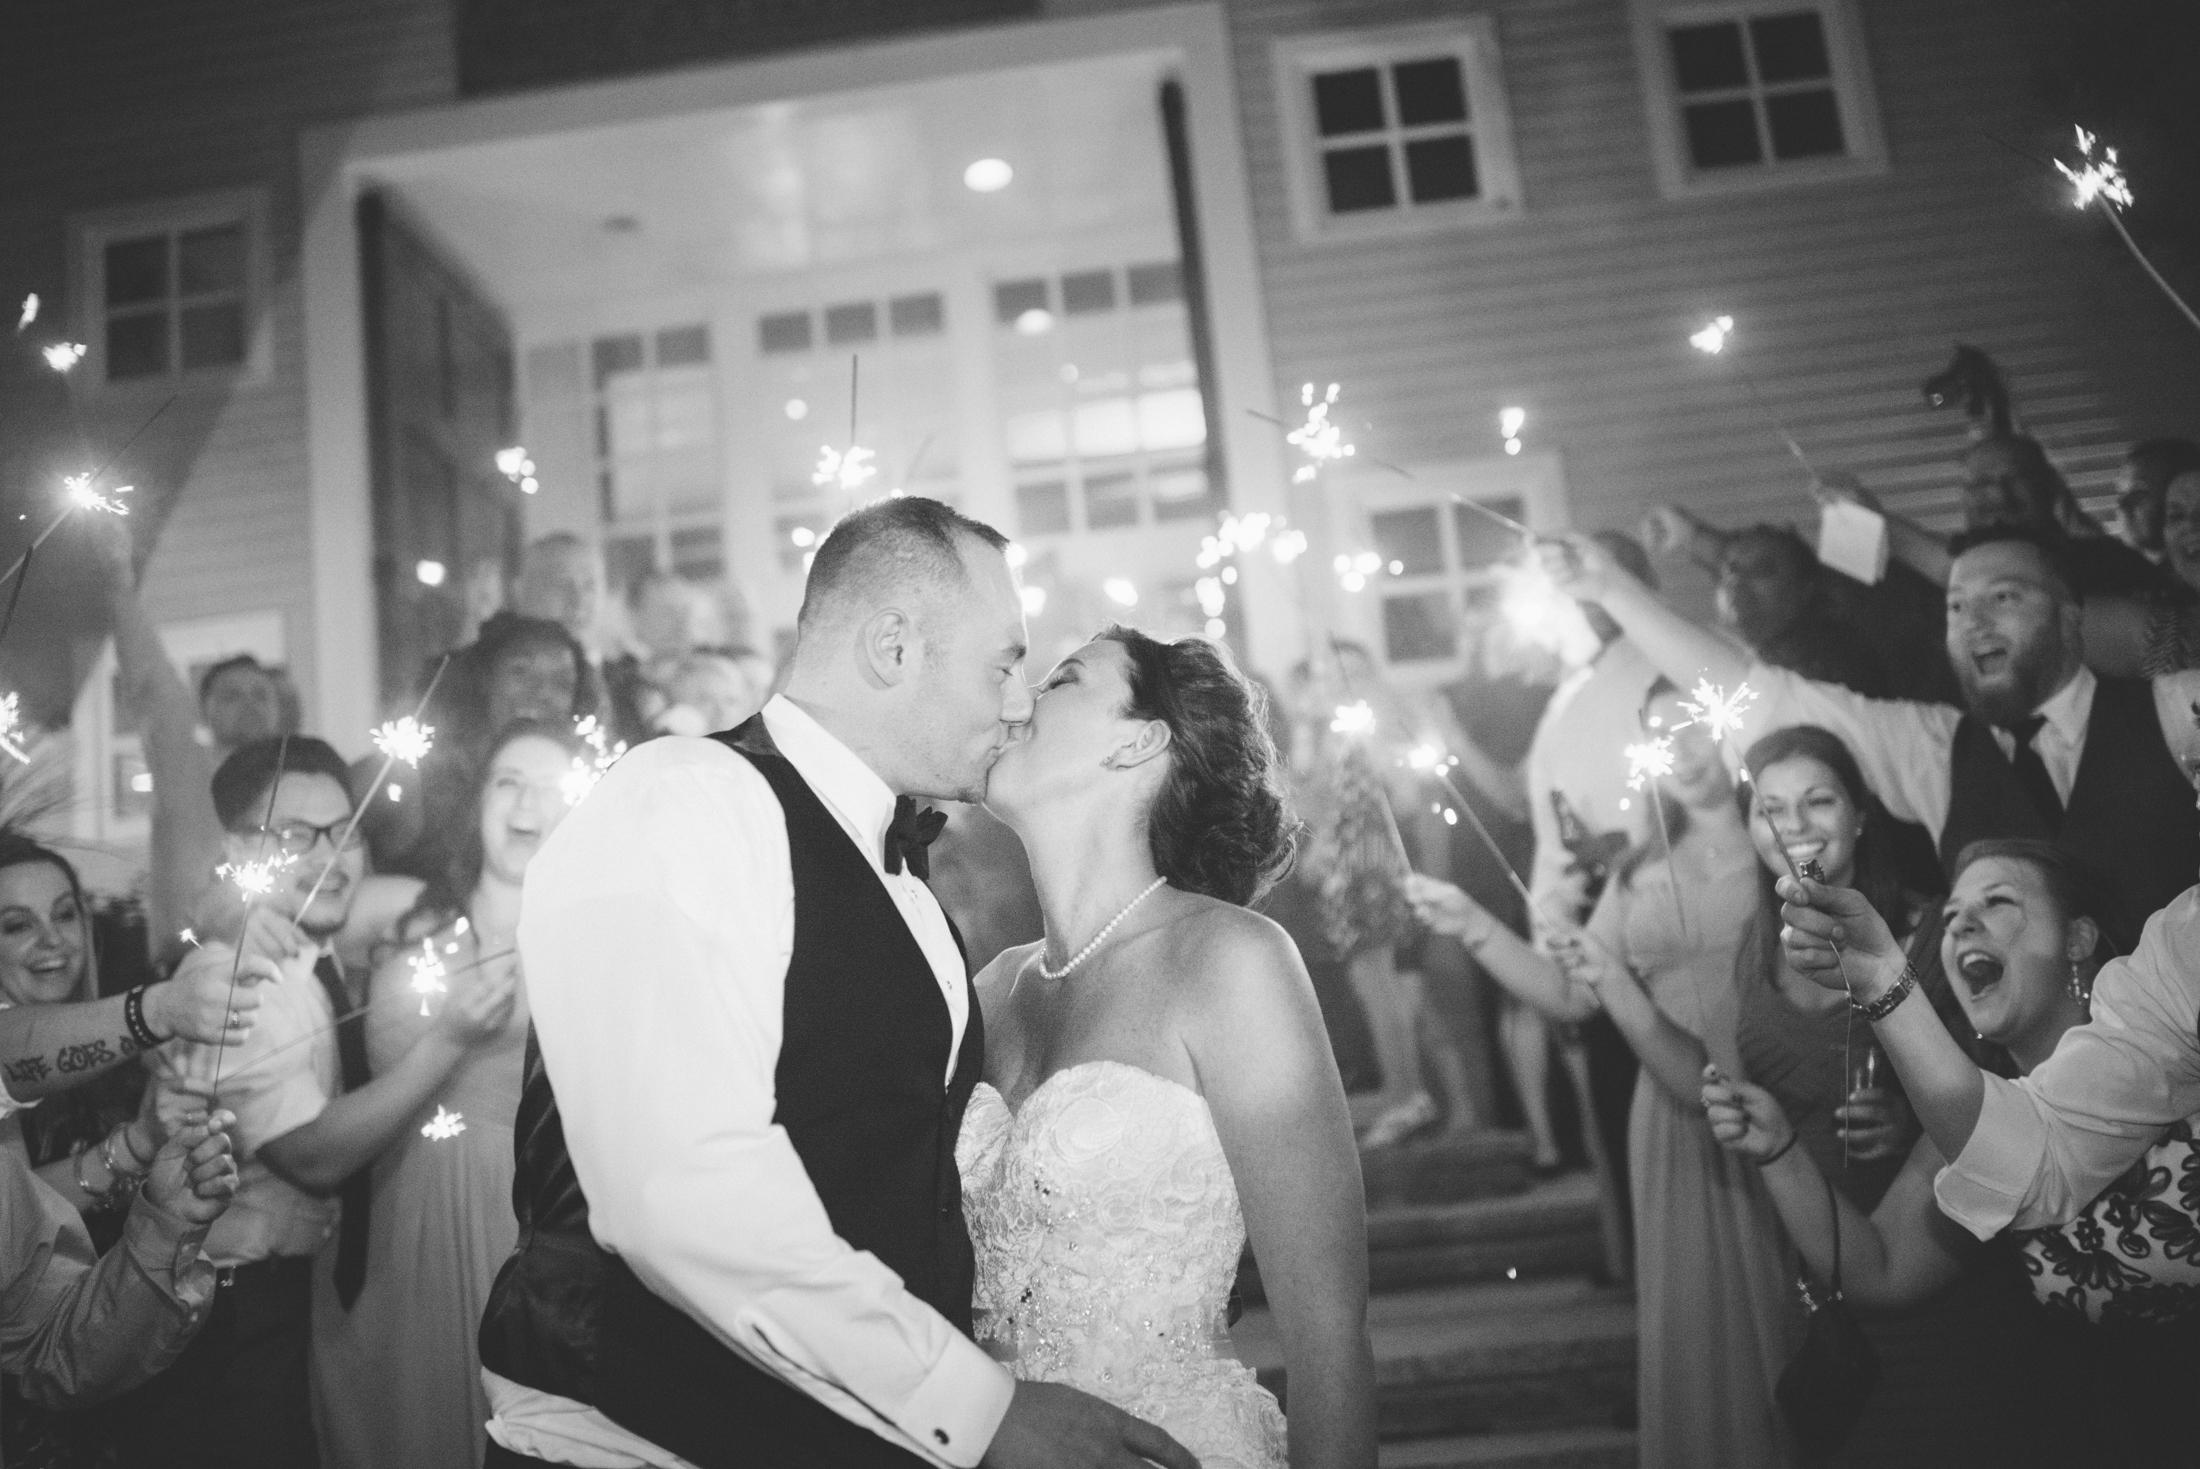 NH Wedding Photographer: Bedford Village Inn at night